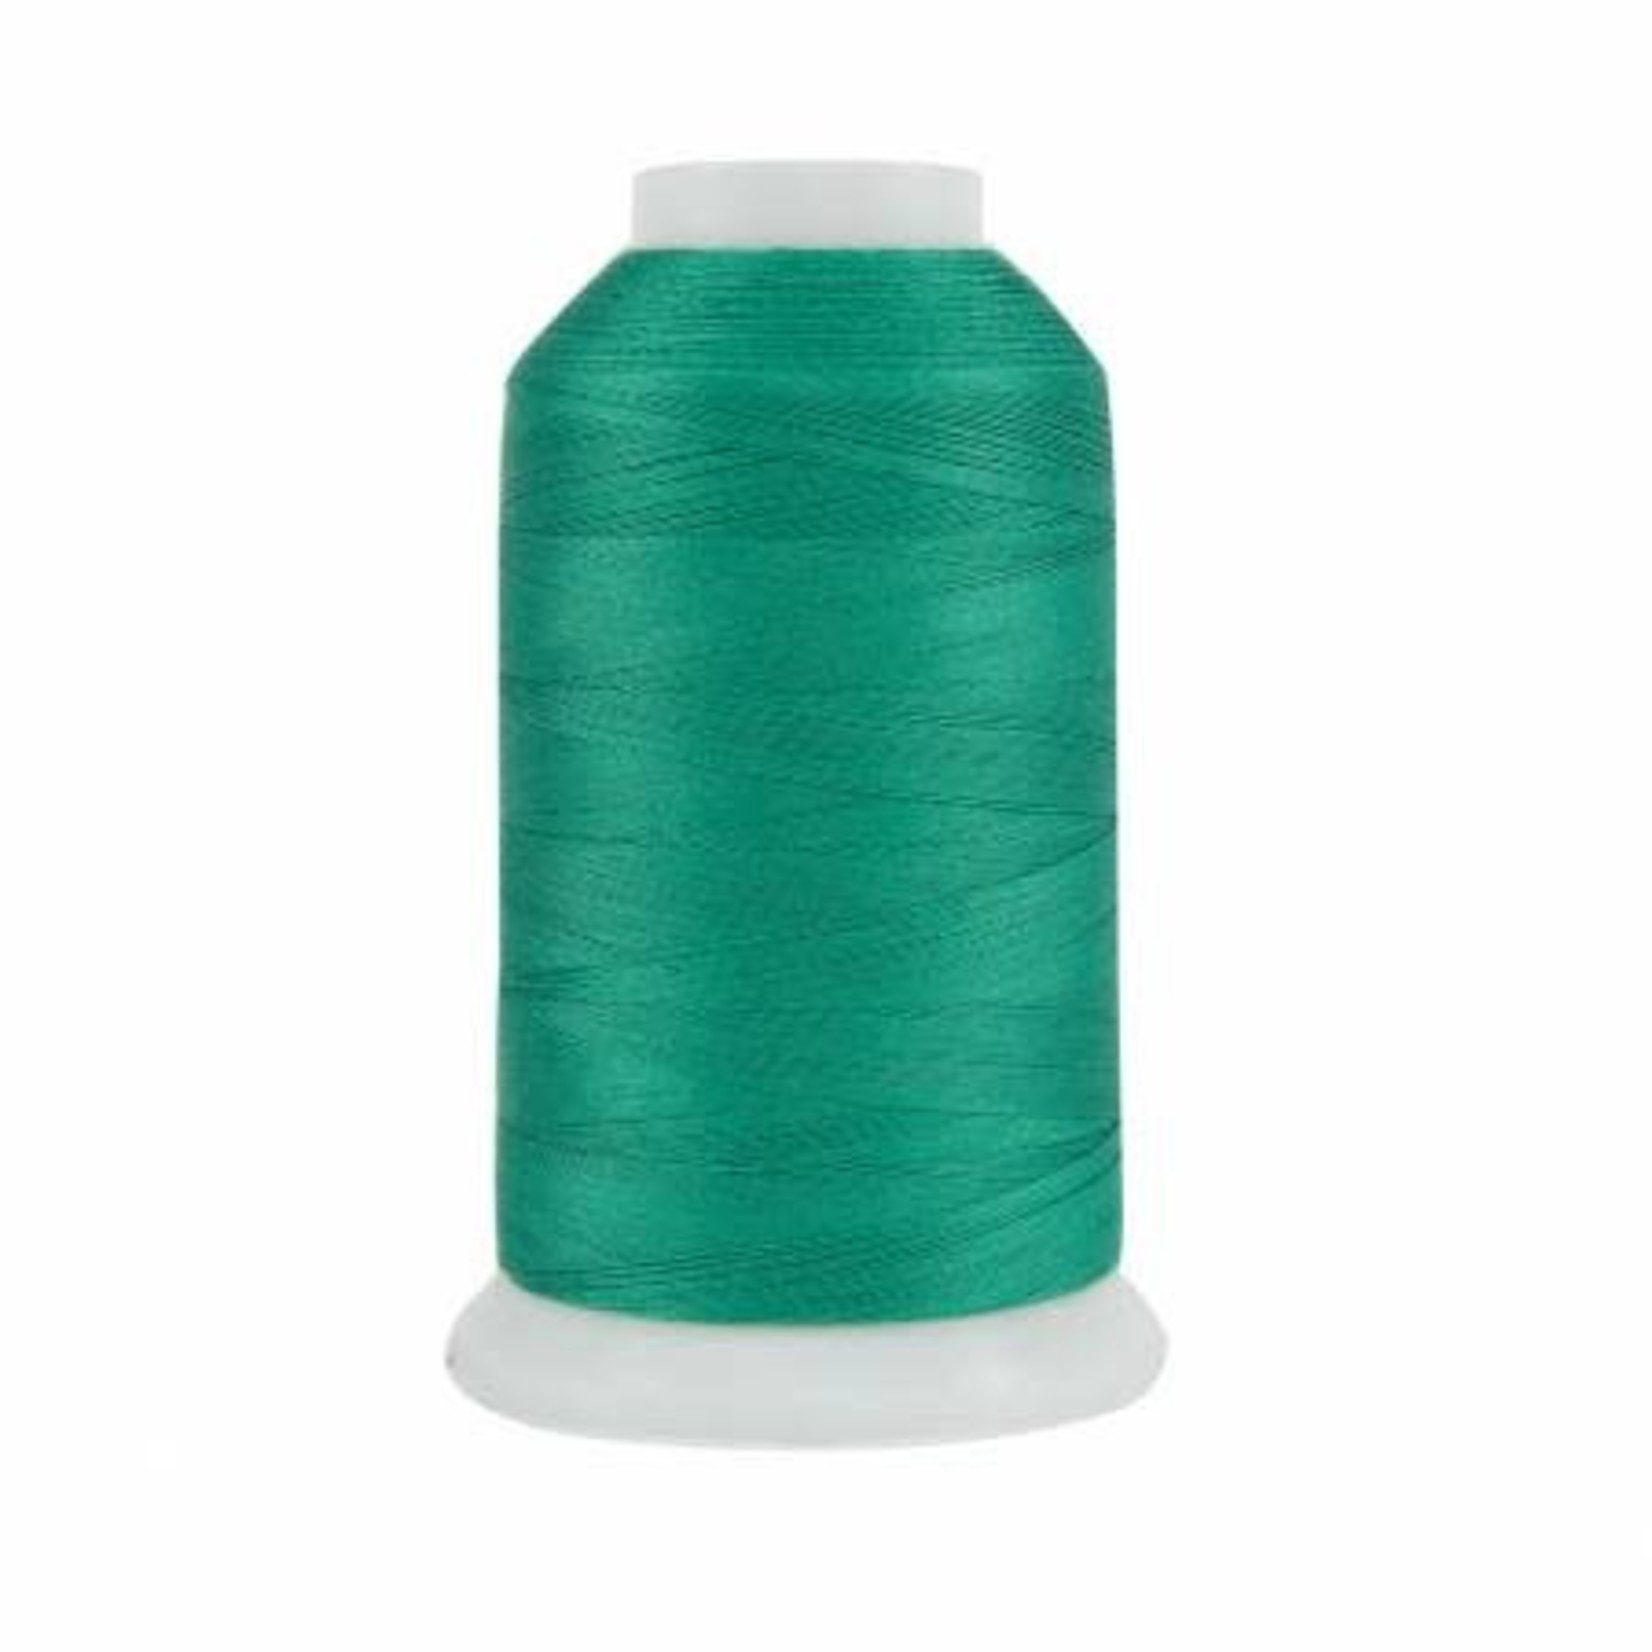 Superior Threads King Tut - #40 - 1828 m - 1024 Chinese Jade